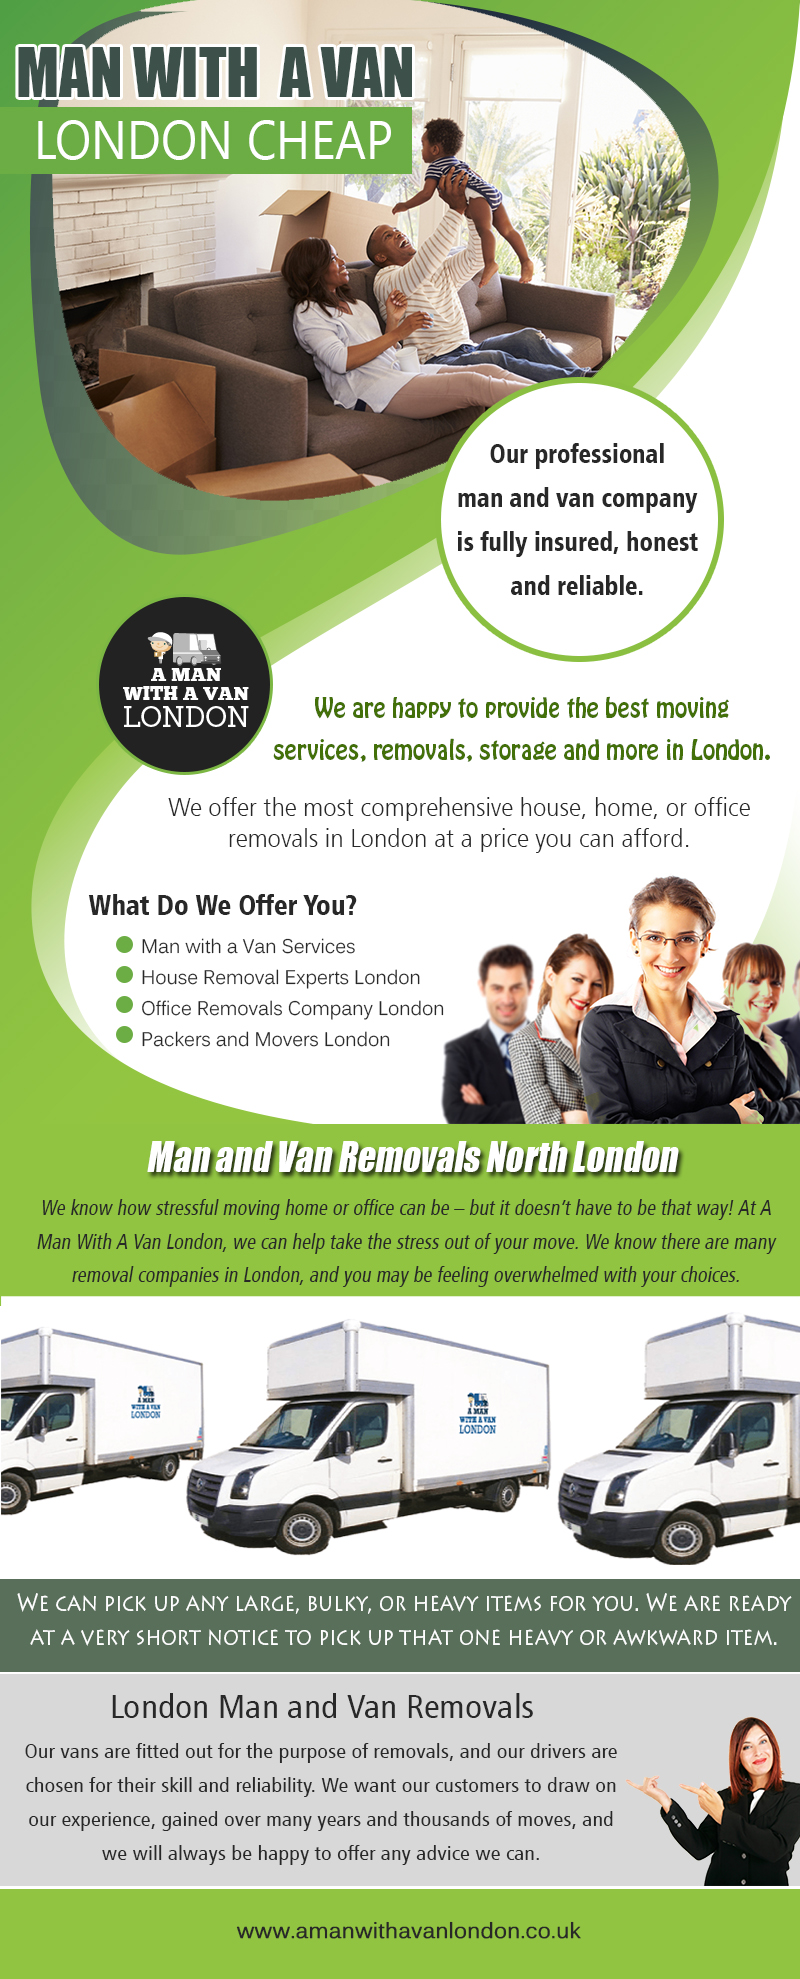 Man With Van London Prices | amanwithavanlondon.co.uk